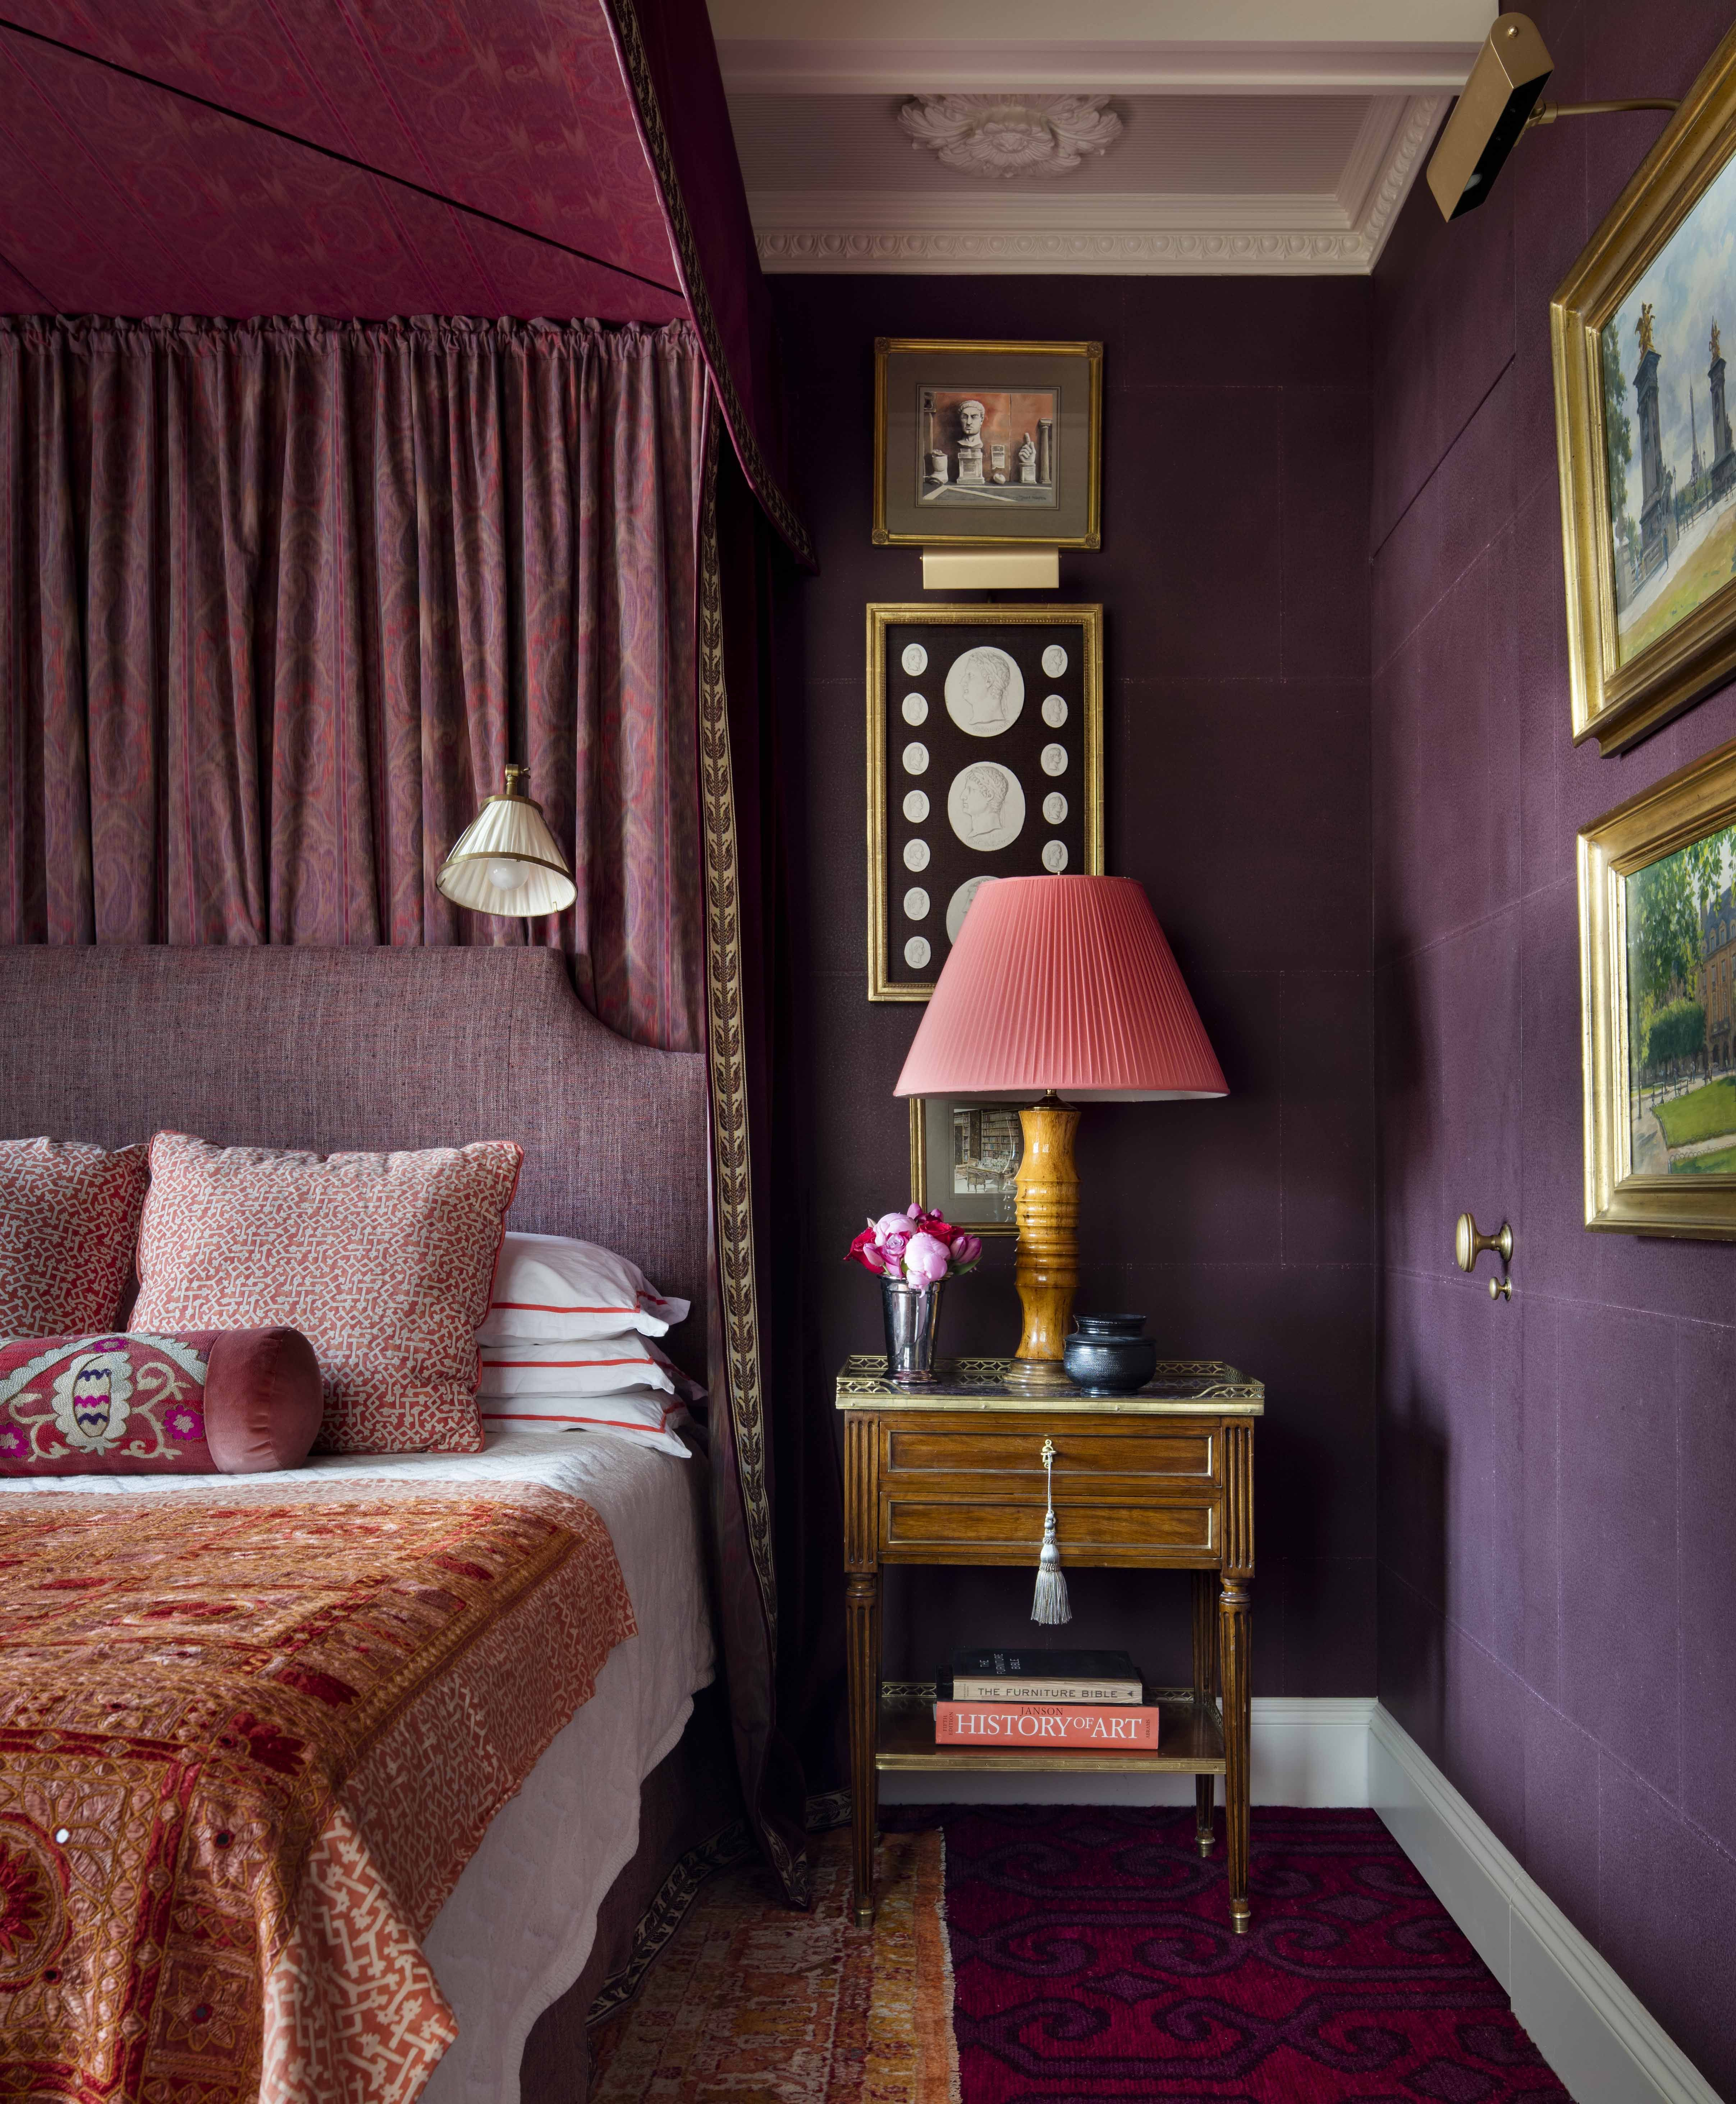 purple bedroom ideas & 10 Stylish Purple Bedrooms - Ideas for Bedroom Decor in Purple